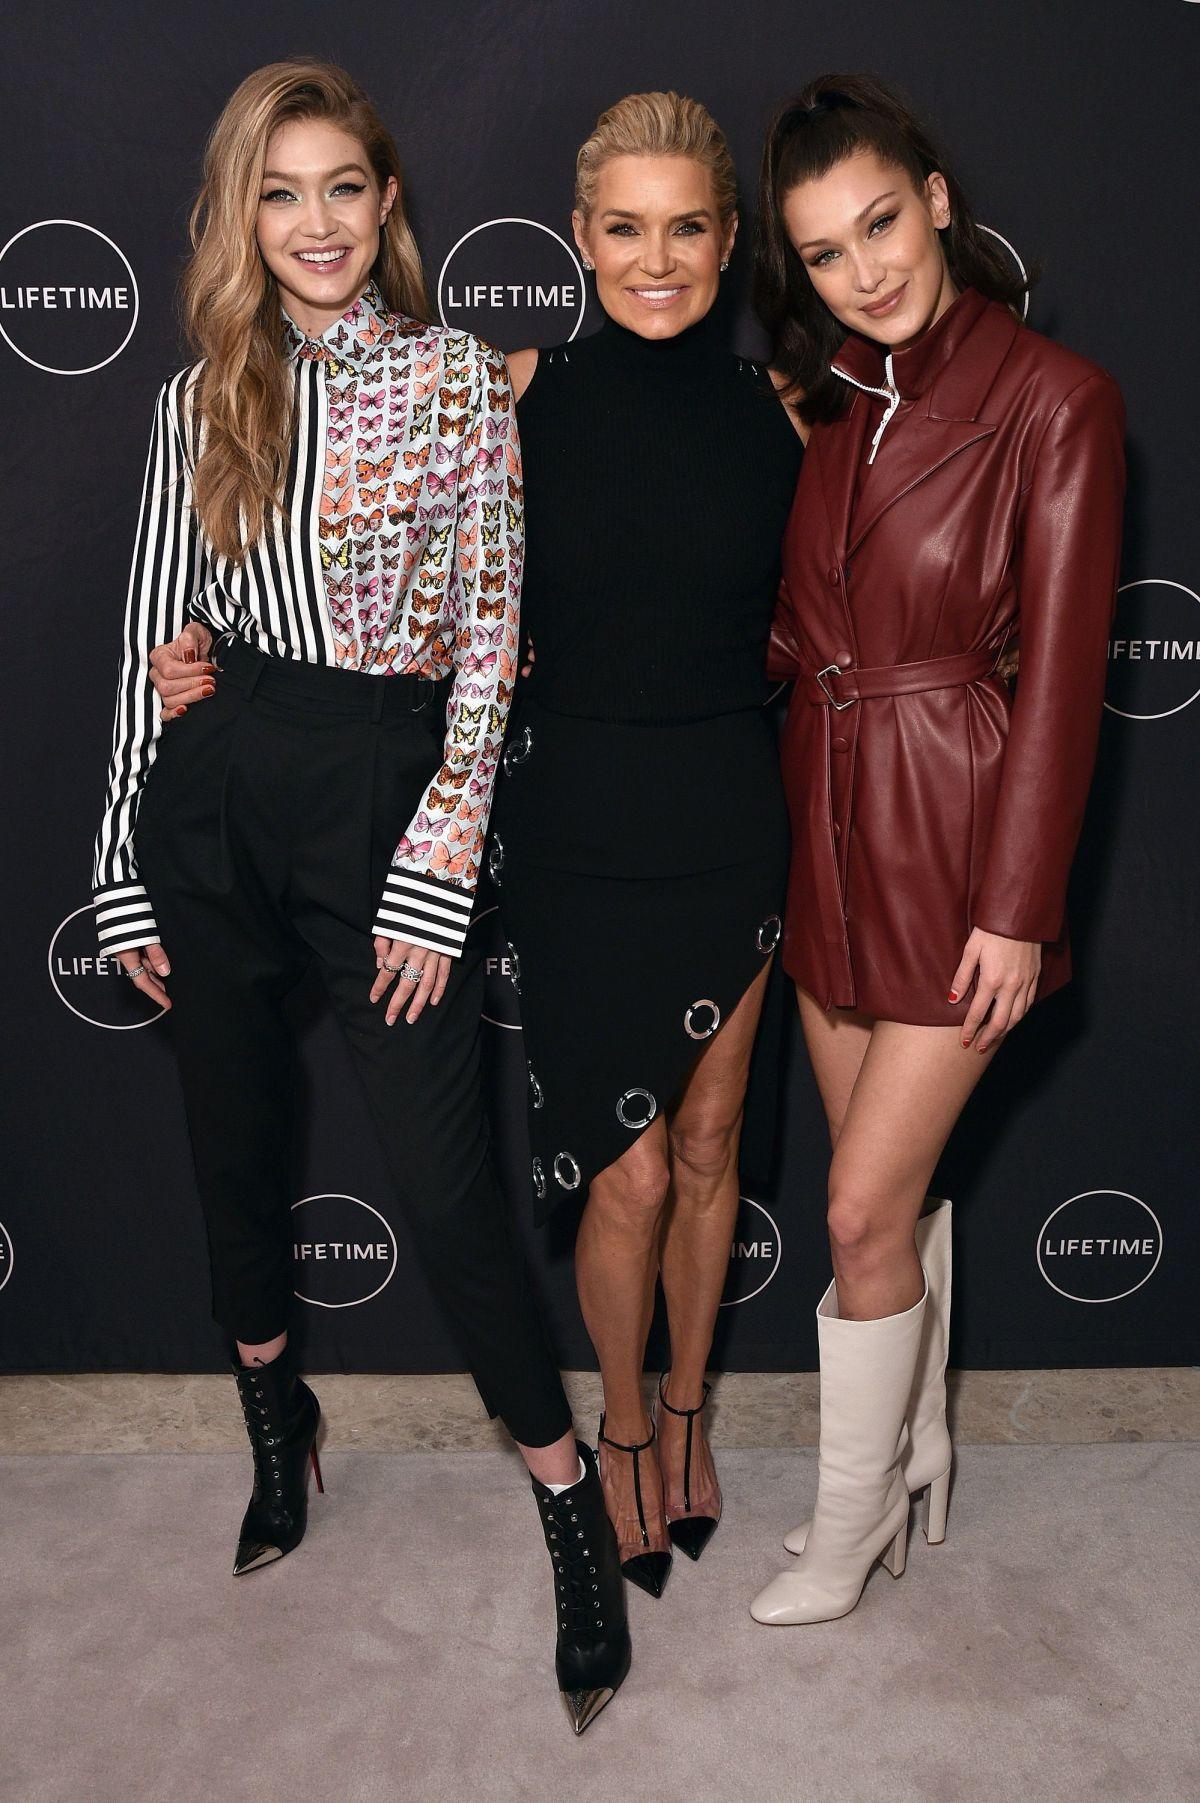 Gigi and Bella hadid at 'Making A Model With Yolanda Hadid' premiere in New York City